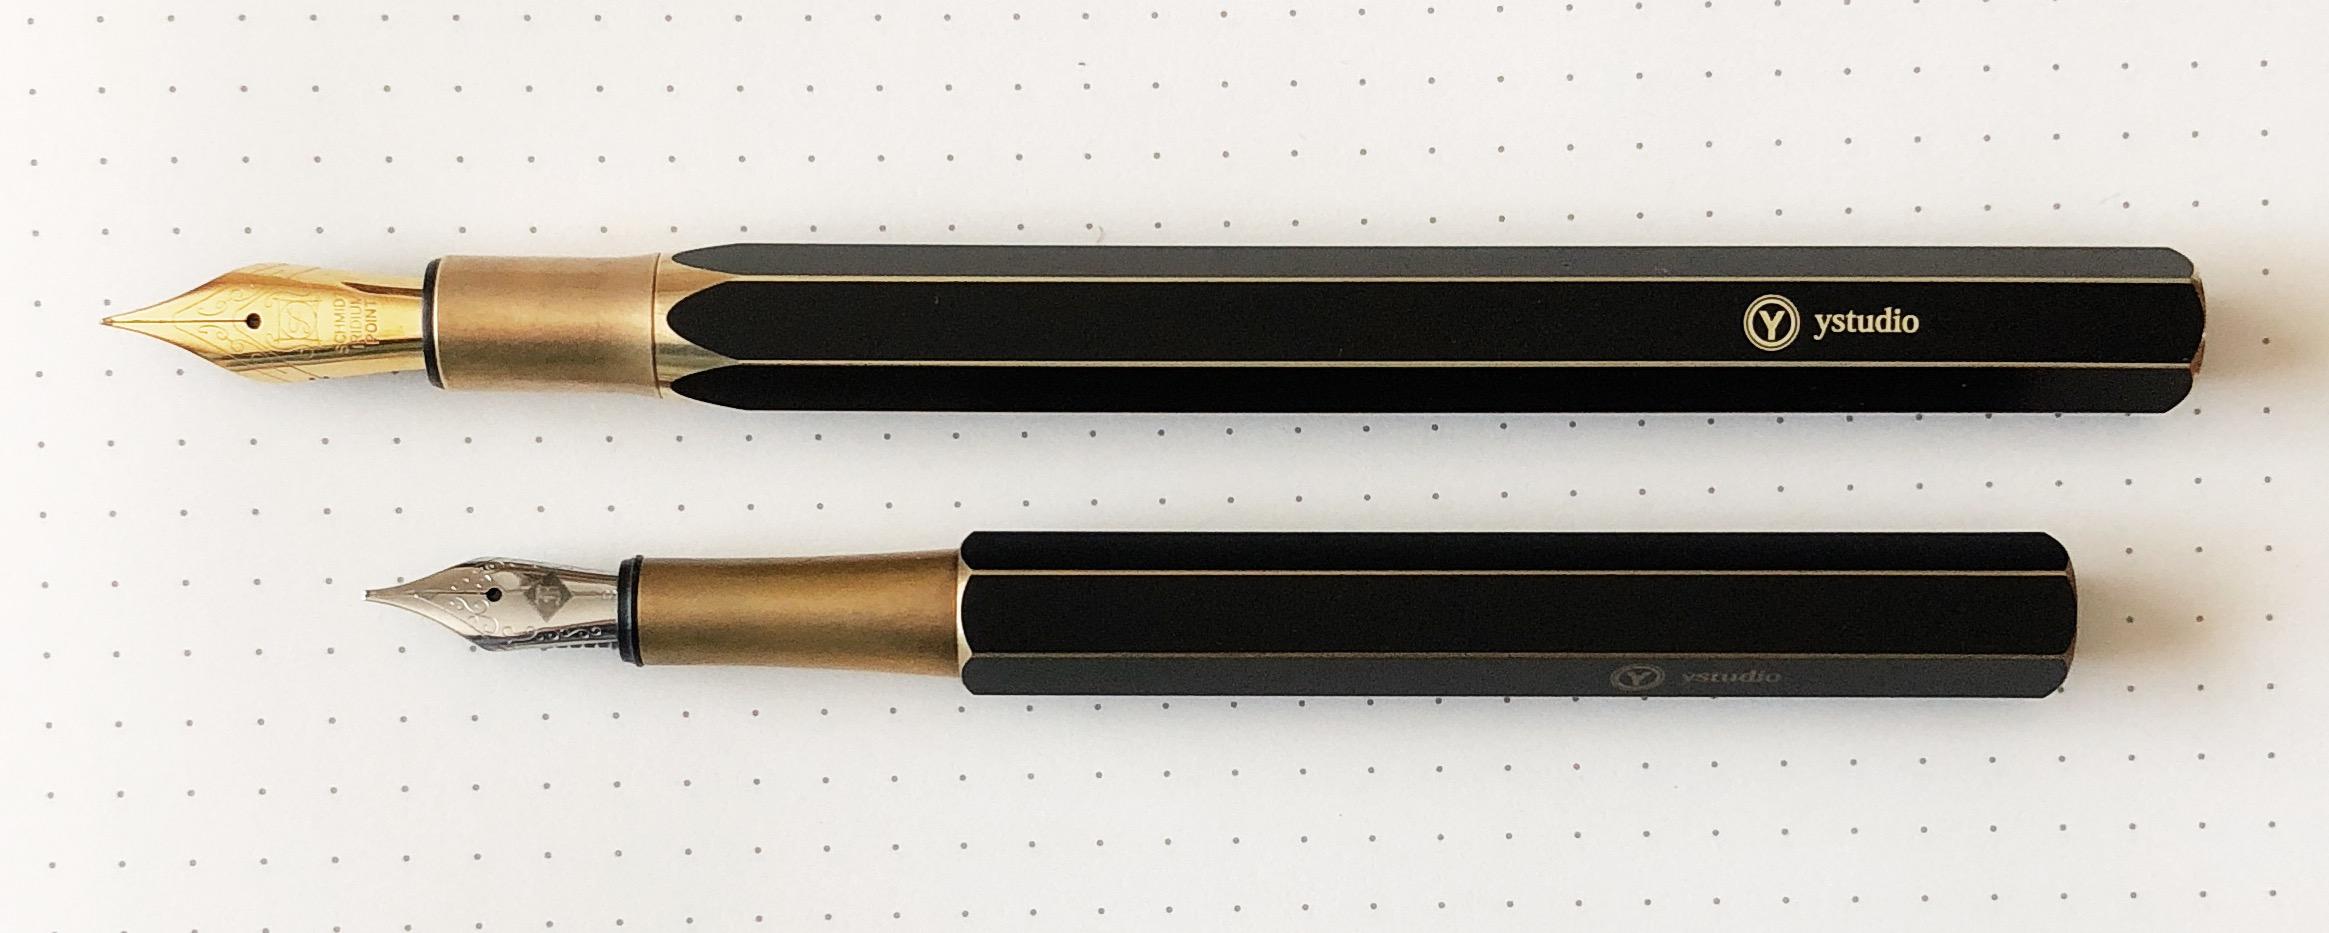 ystudio Brassing Desk vs Standard Fountain Pen